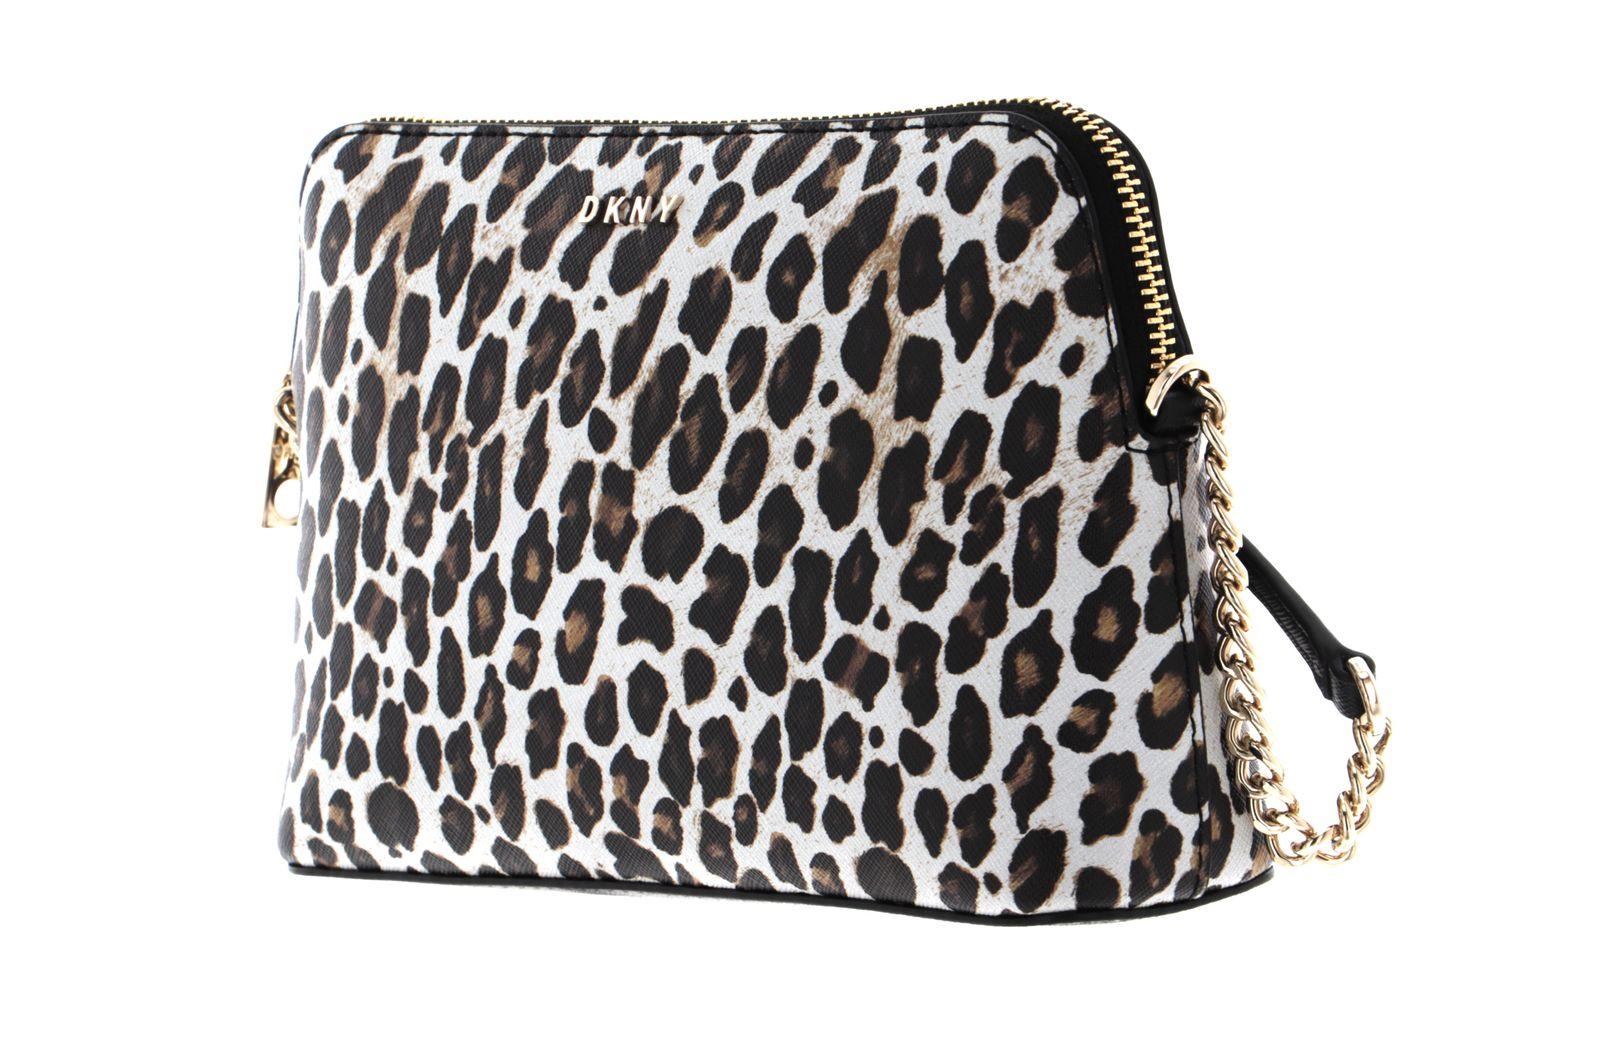 DKNY Bryant Dome Crossbody Leopard